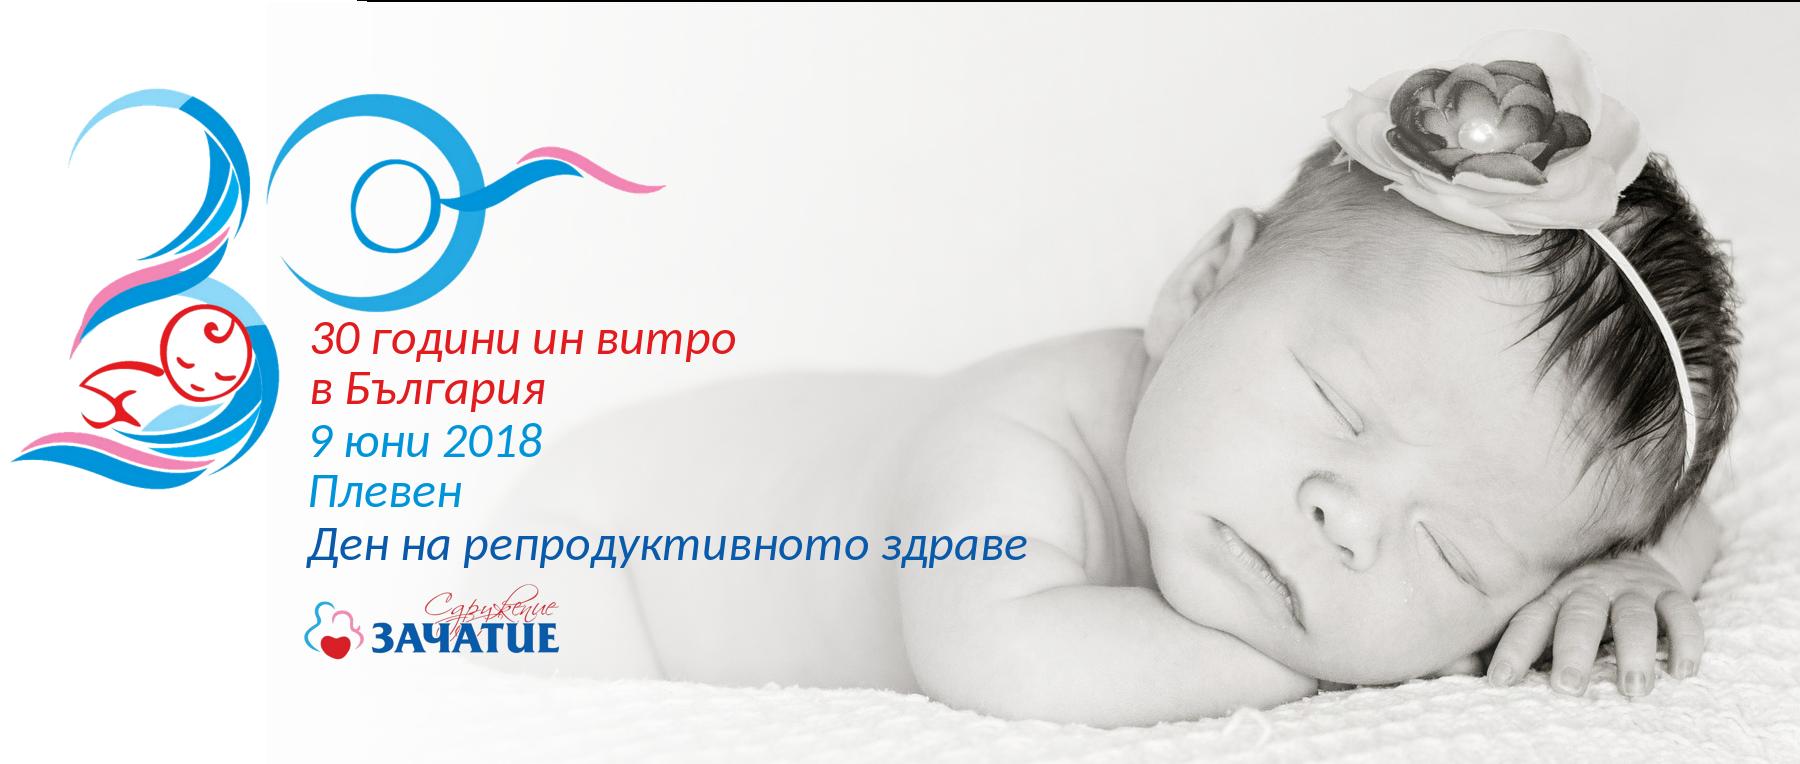 Ден на репродуктивното здраве 9 юни 2018 в Плевен